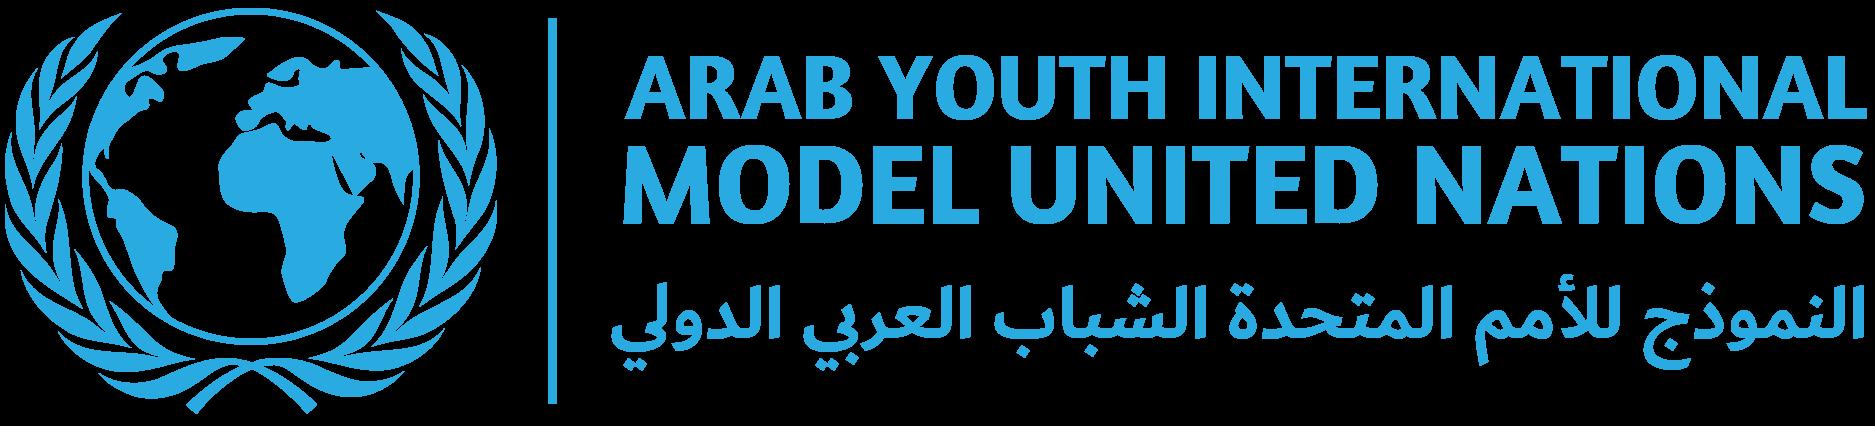 Arab Youth International MUN